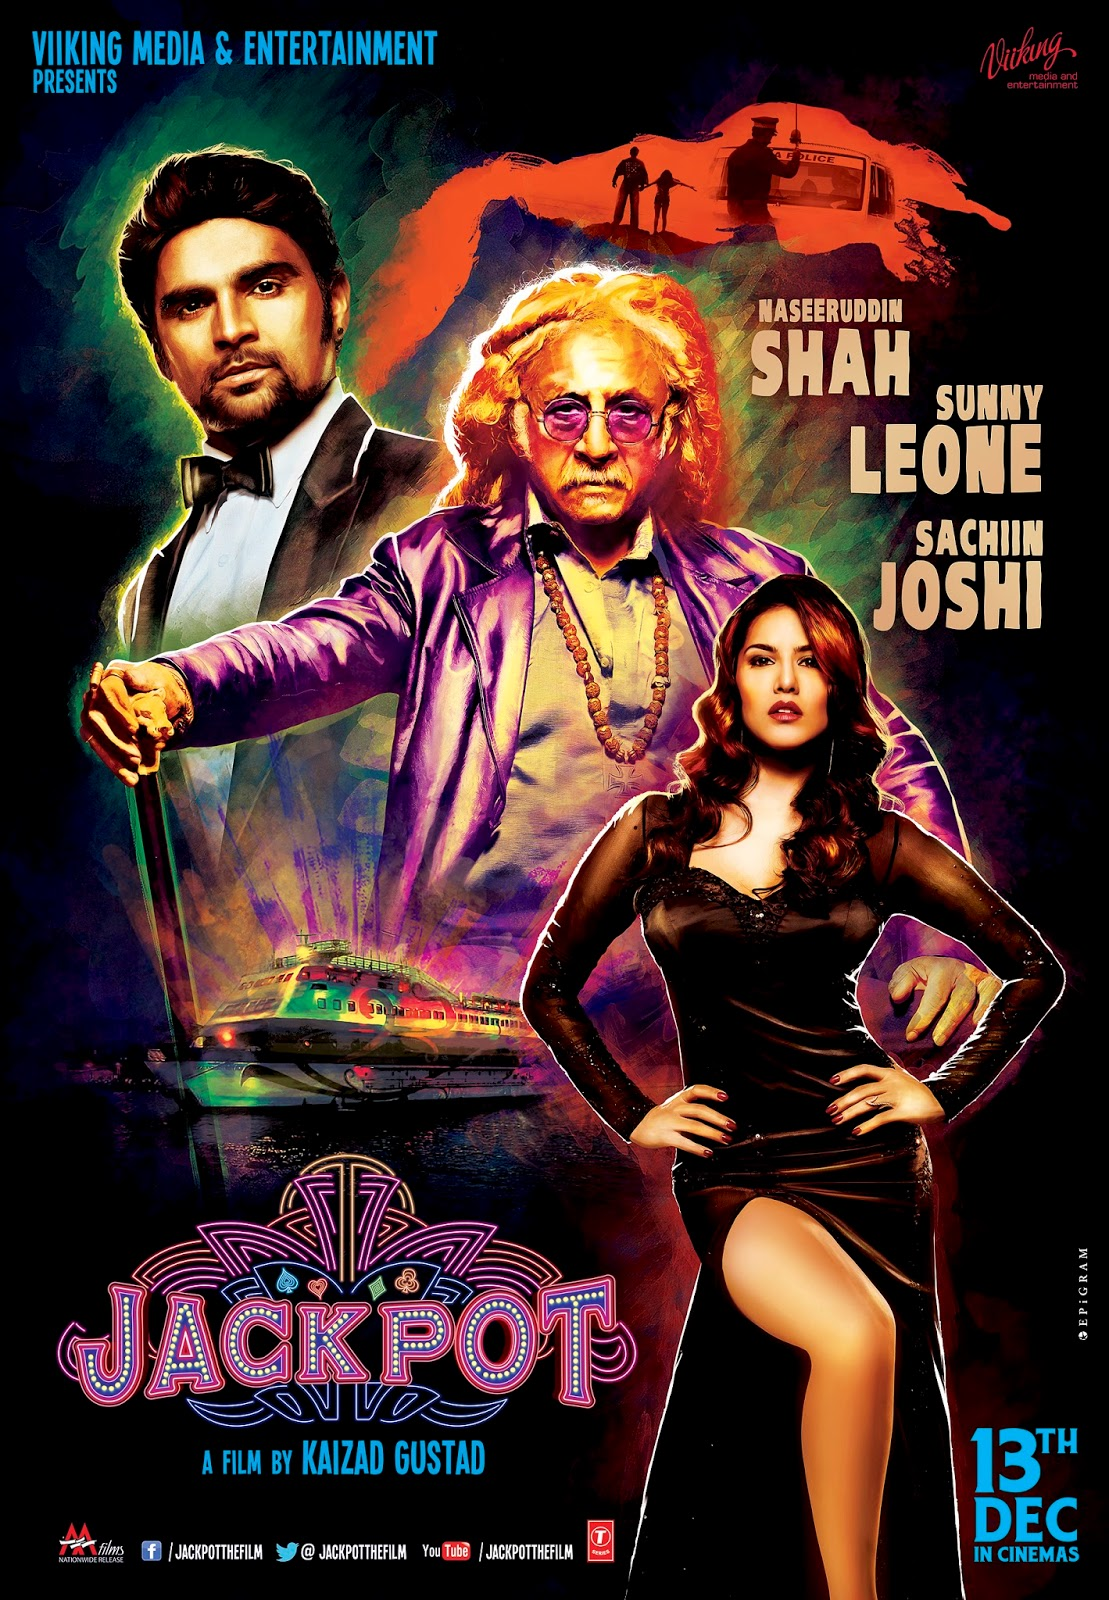 sunny leone , sachin joshi, naseeruddin shah in jackpot movie poster